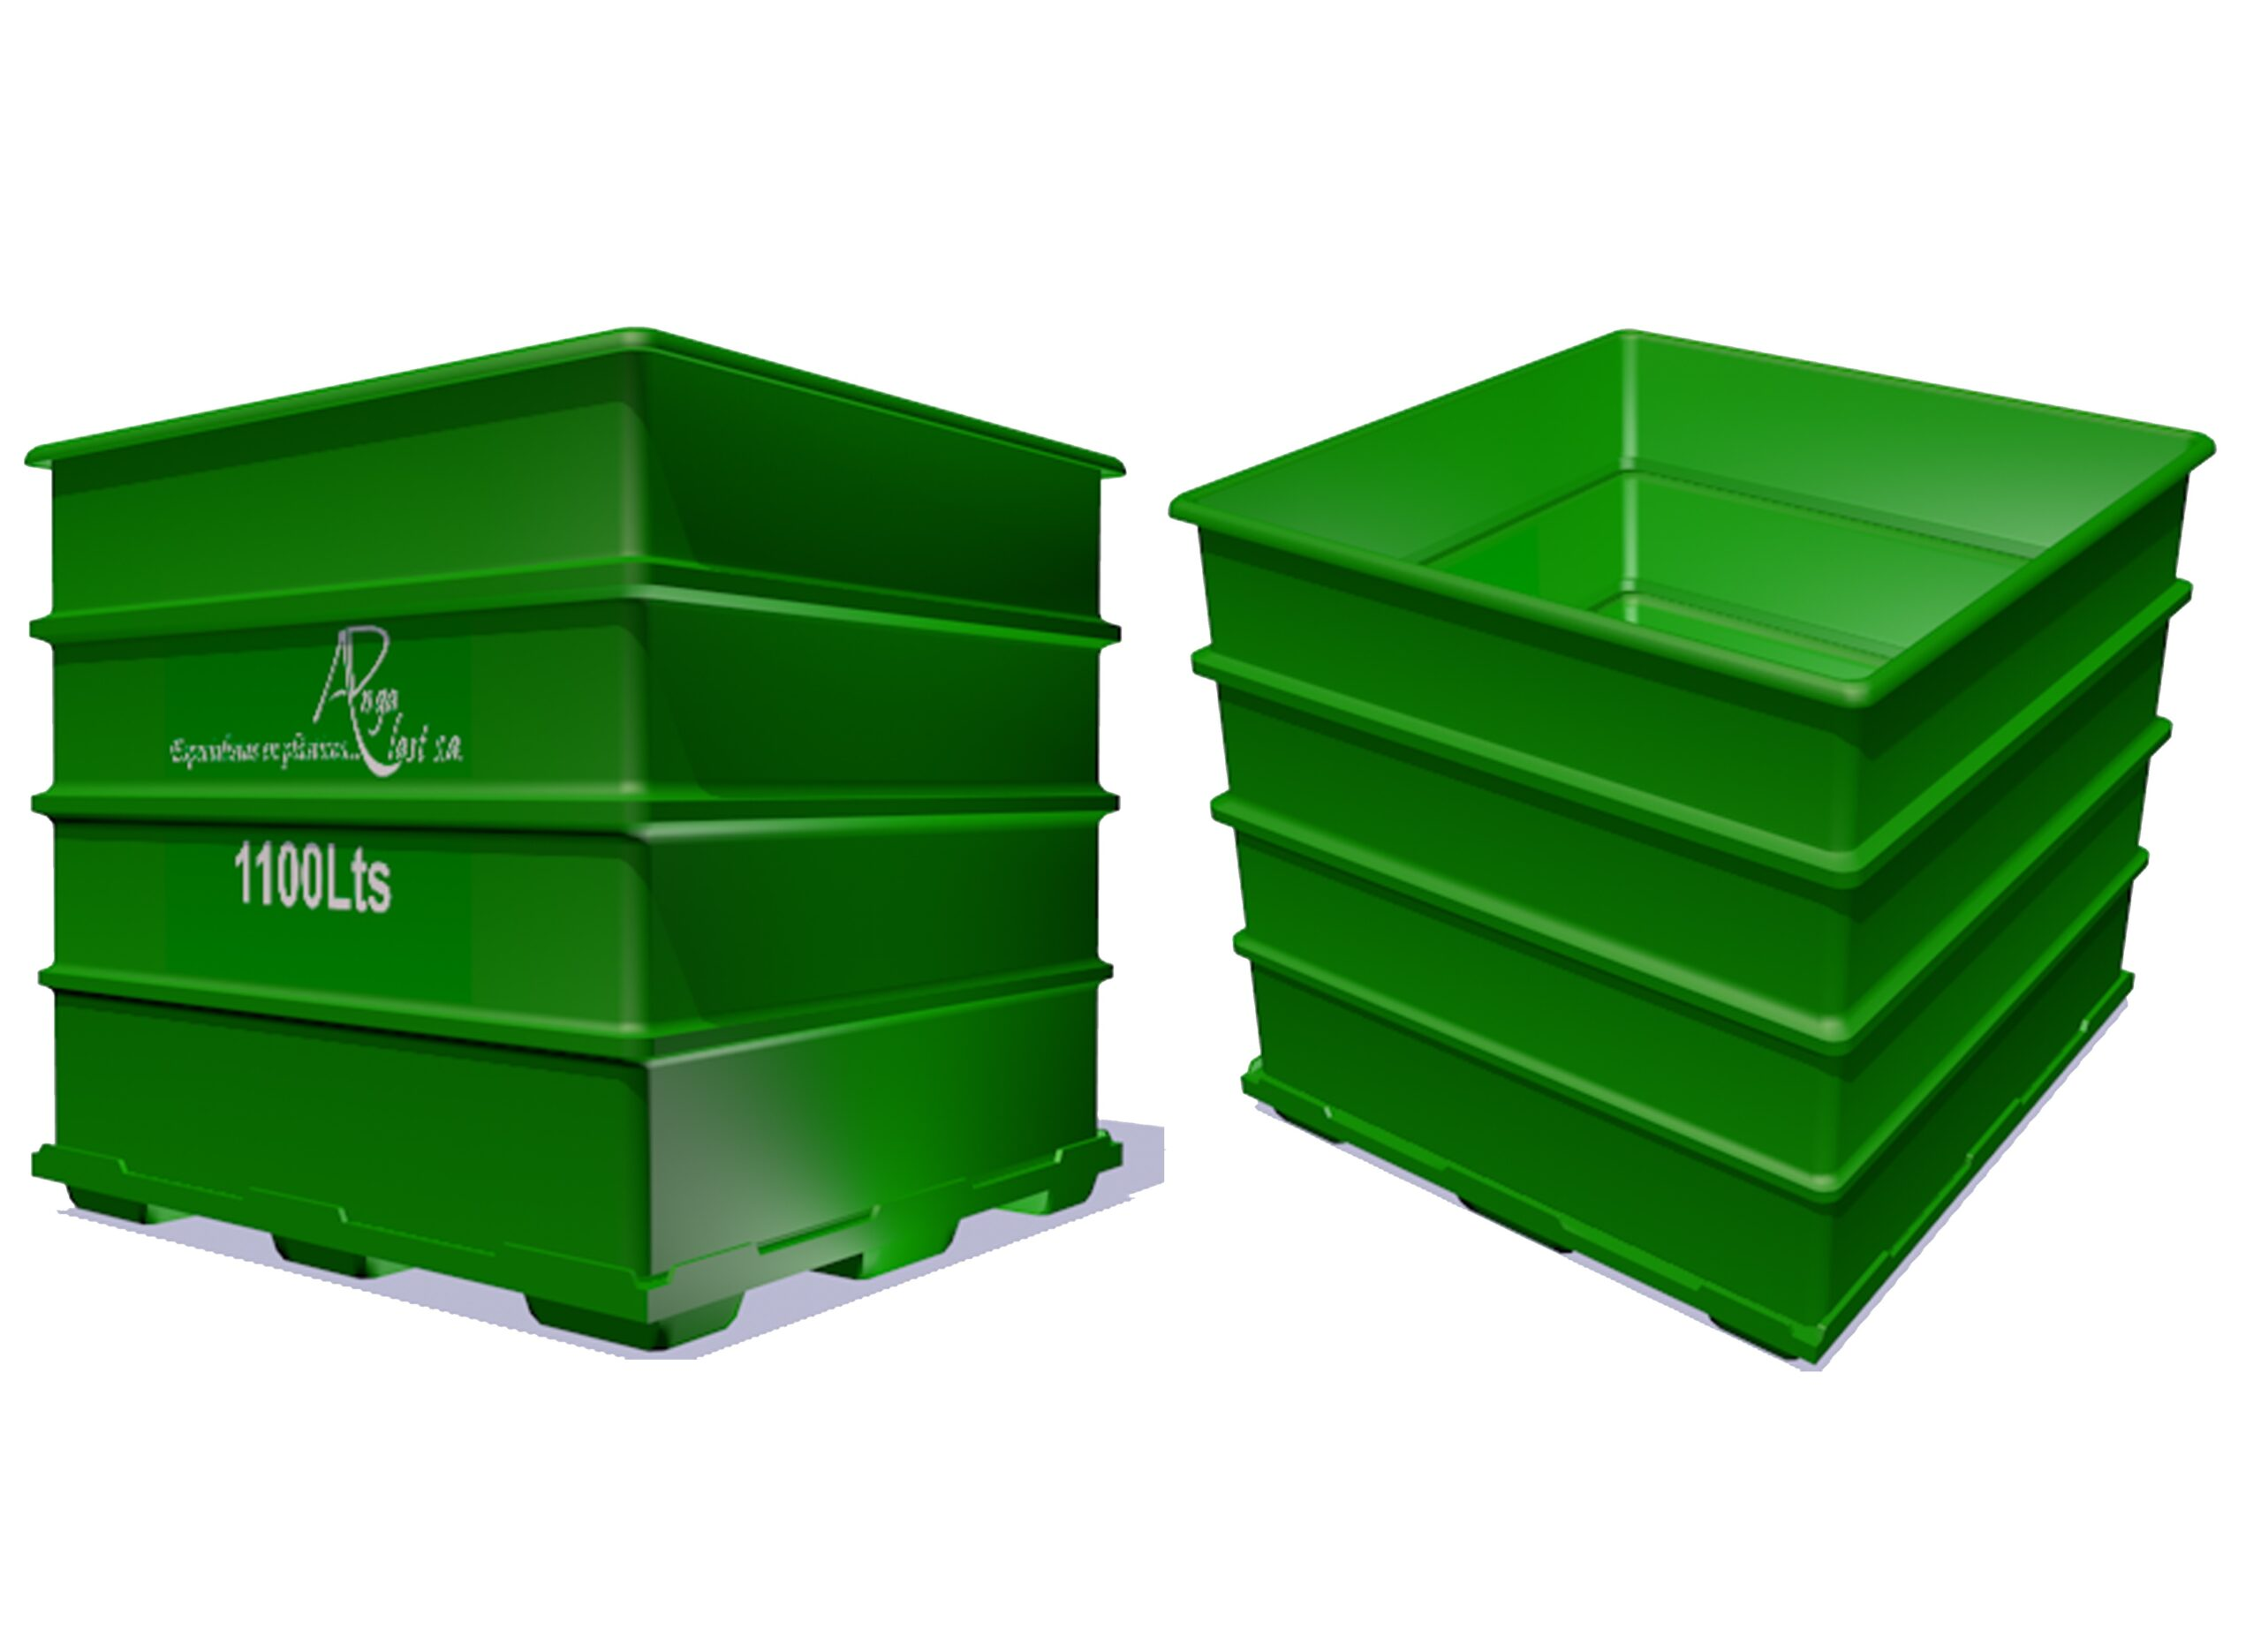 Tacho reciclador de 1100 litros